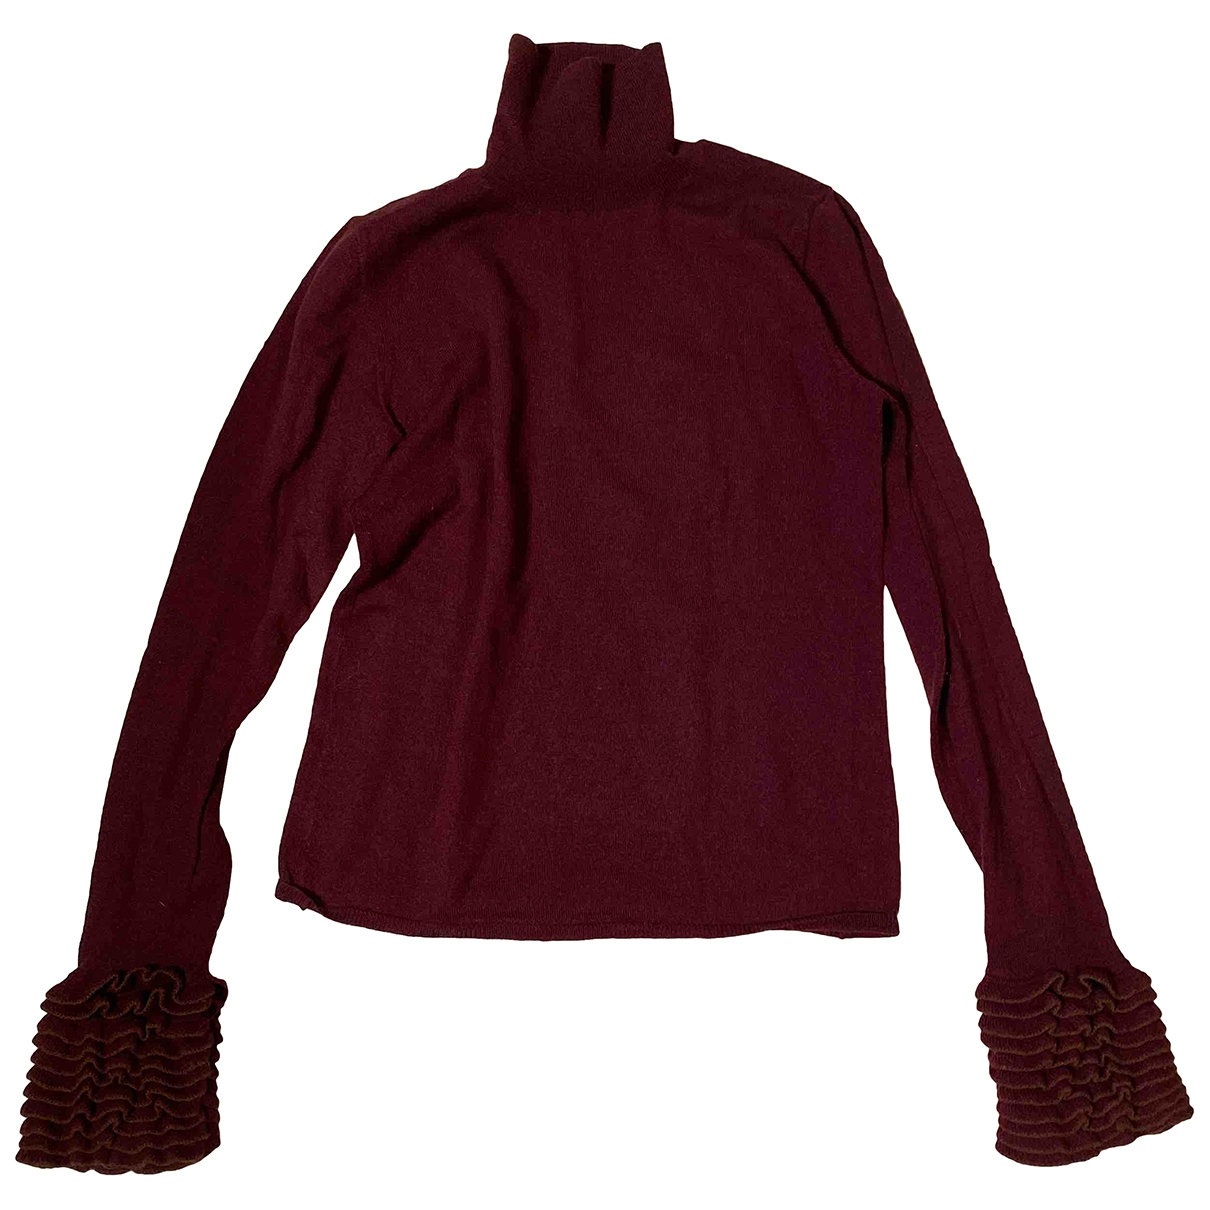 Dkny \N Burgundy Wool Knitwear for Women M International